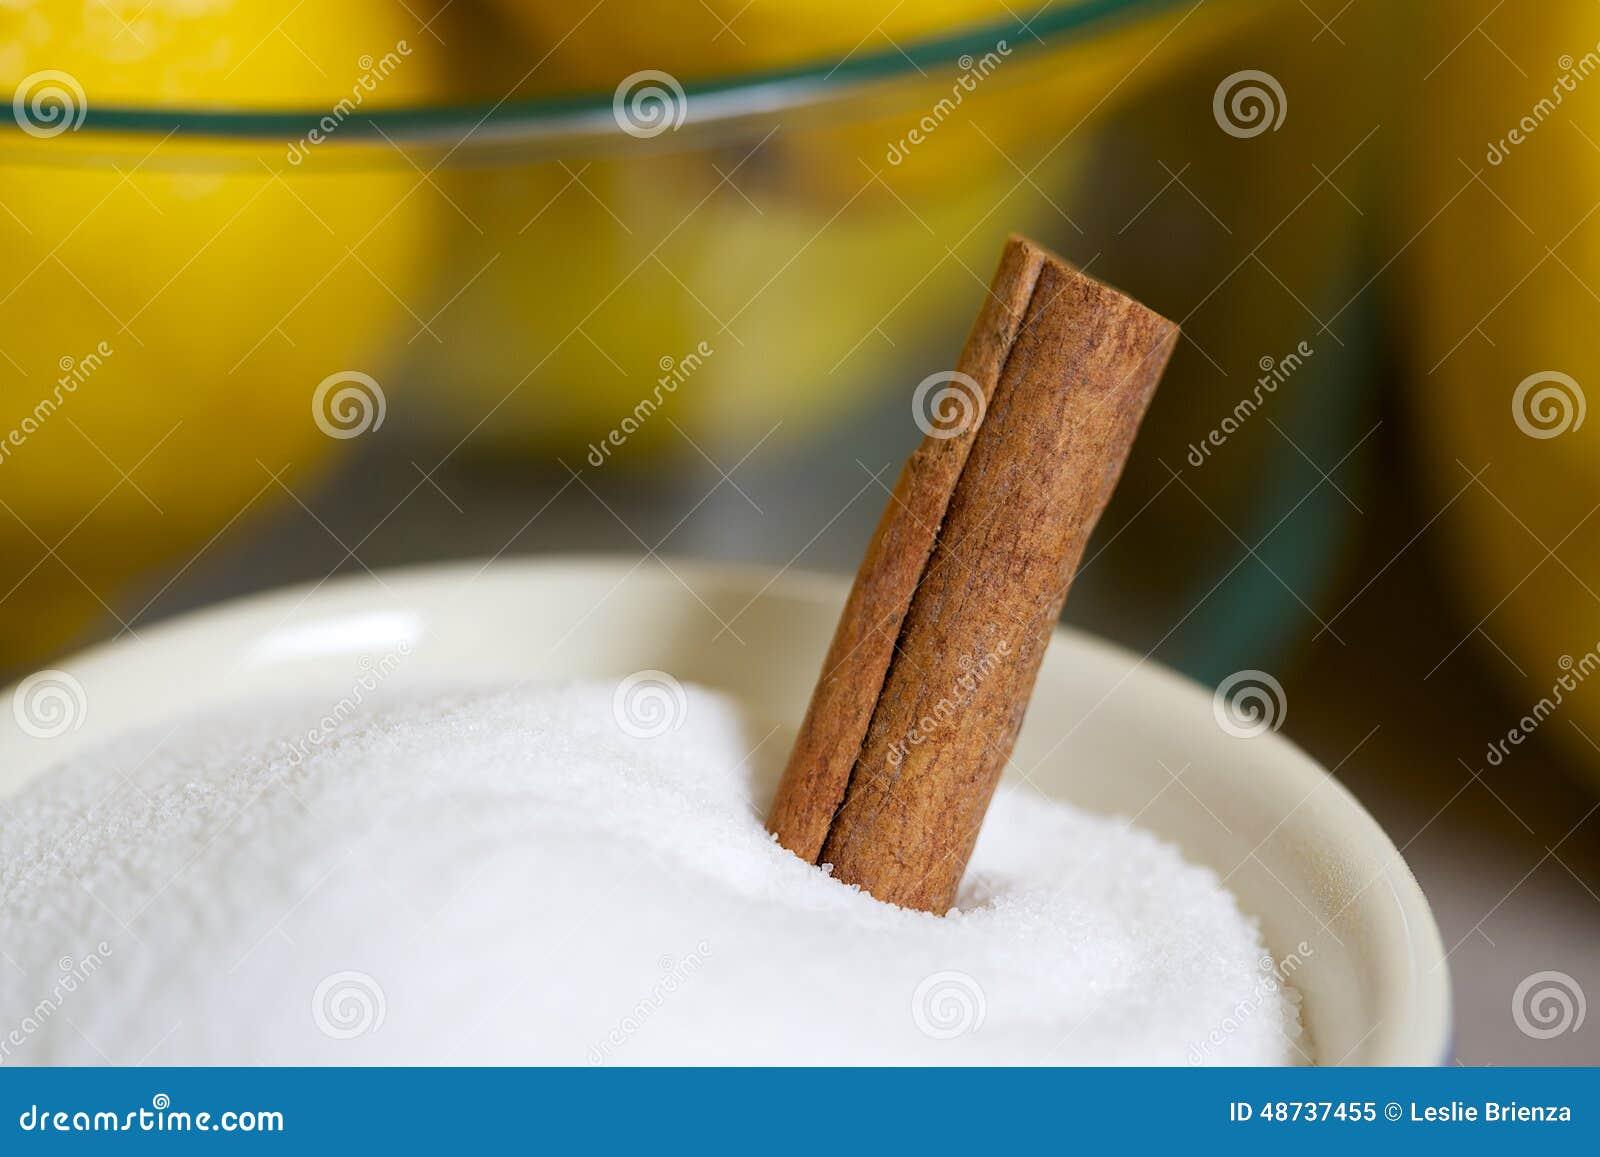 Ингридиенты для Limoncello включая лимоны, сахар и циннамон